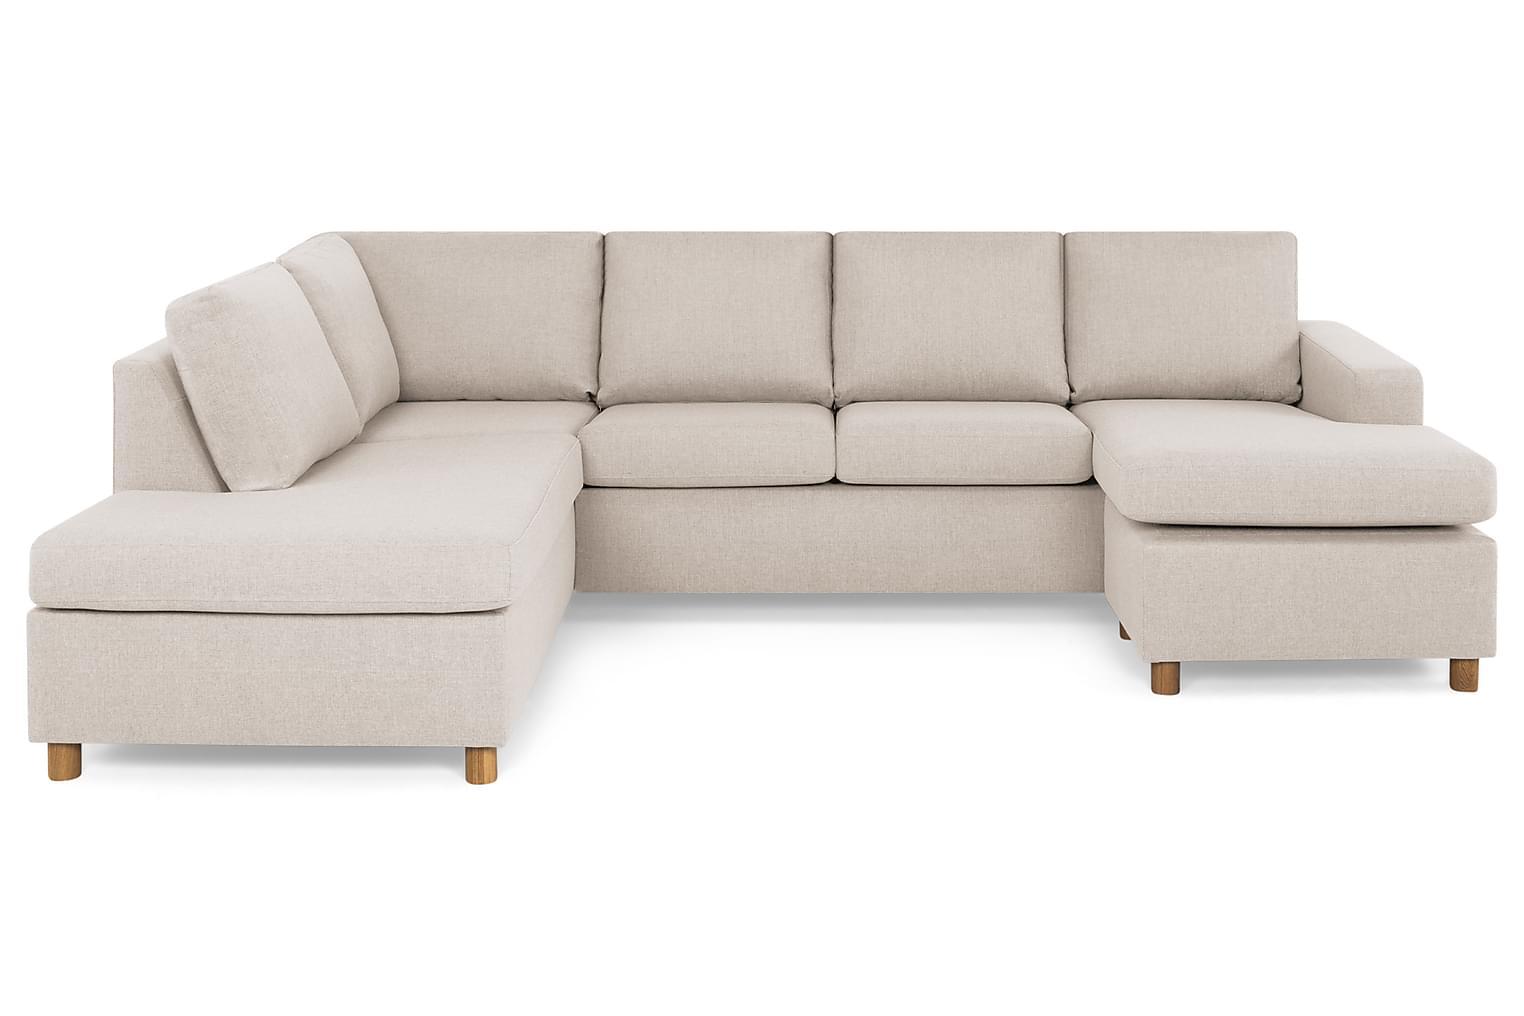 New NEW YORK Large U-soffa Vänster Beige -